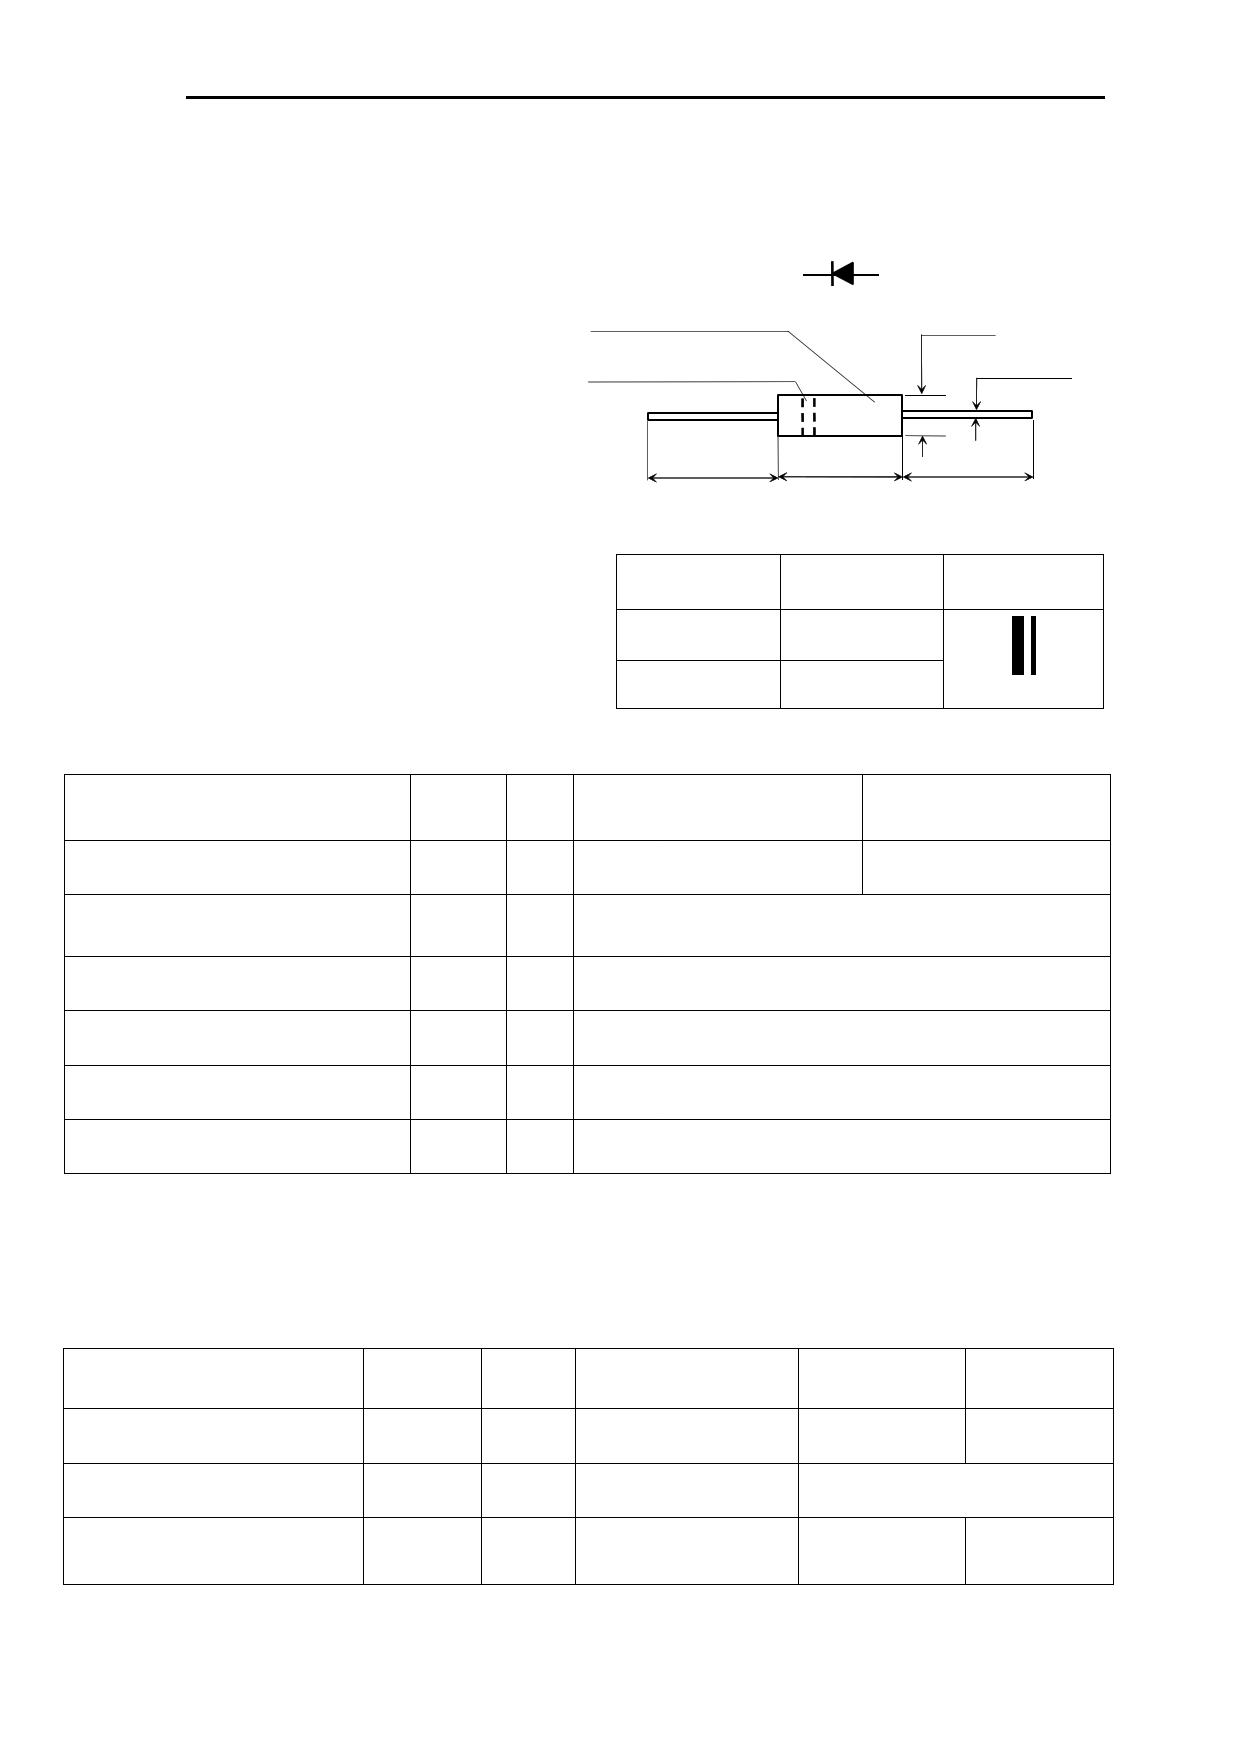 2CL3512 datasheet